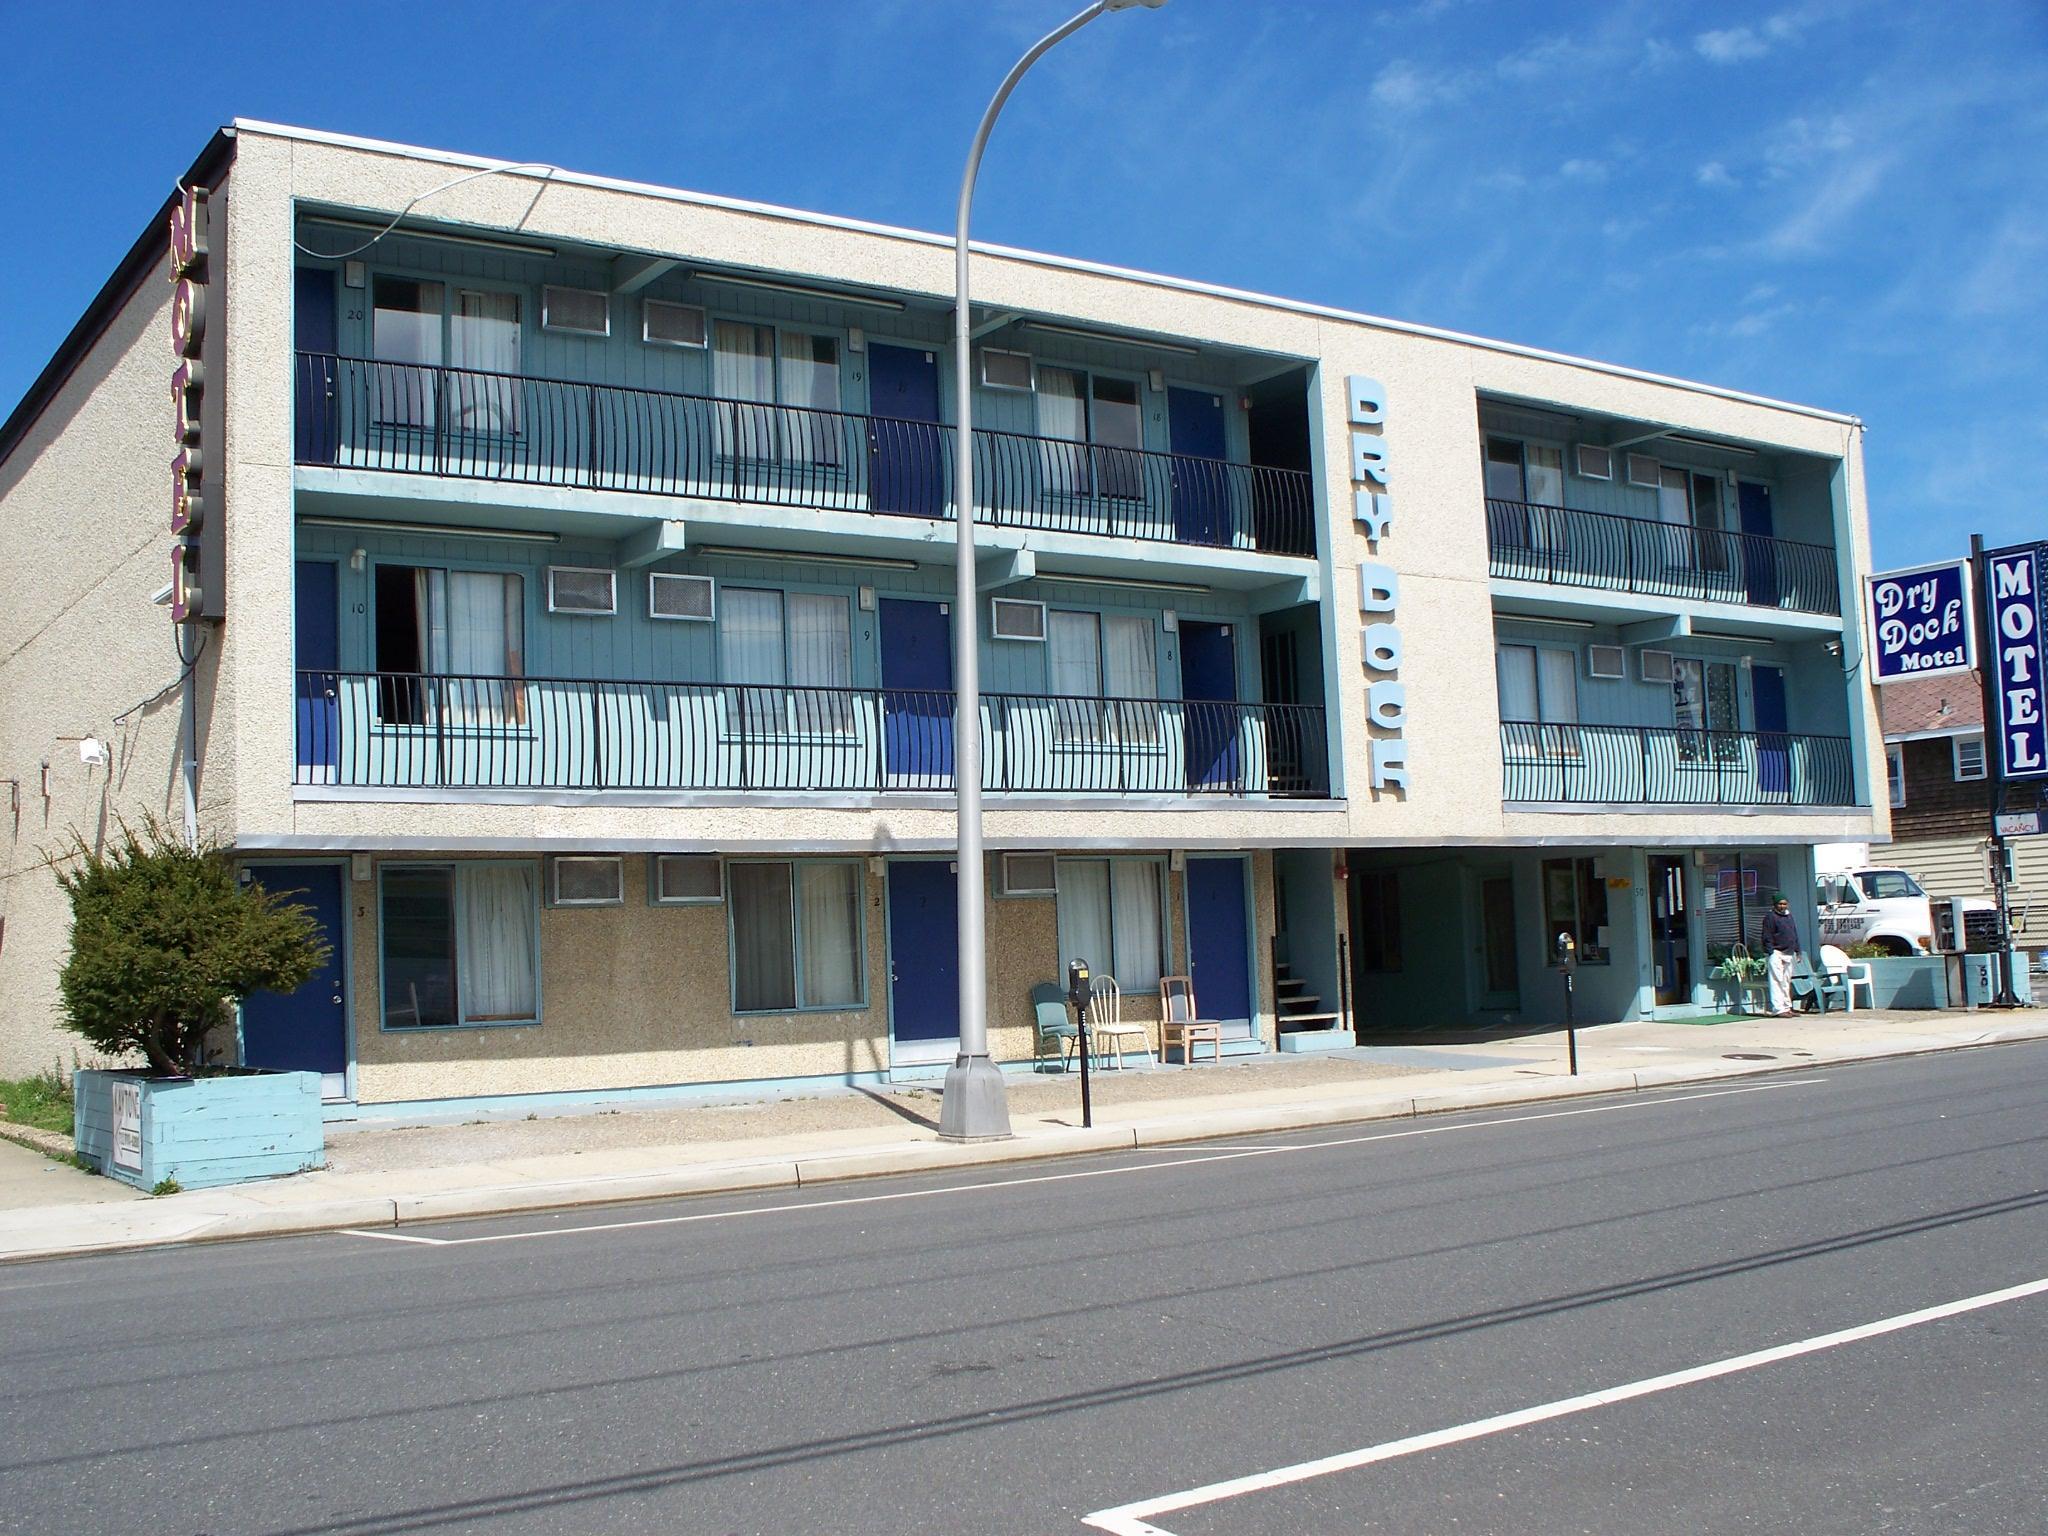 Dry Dock Motel Seaside Heights